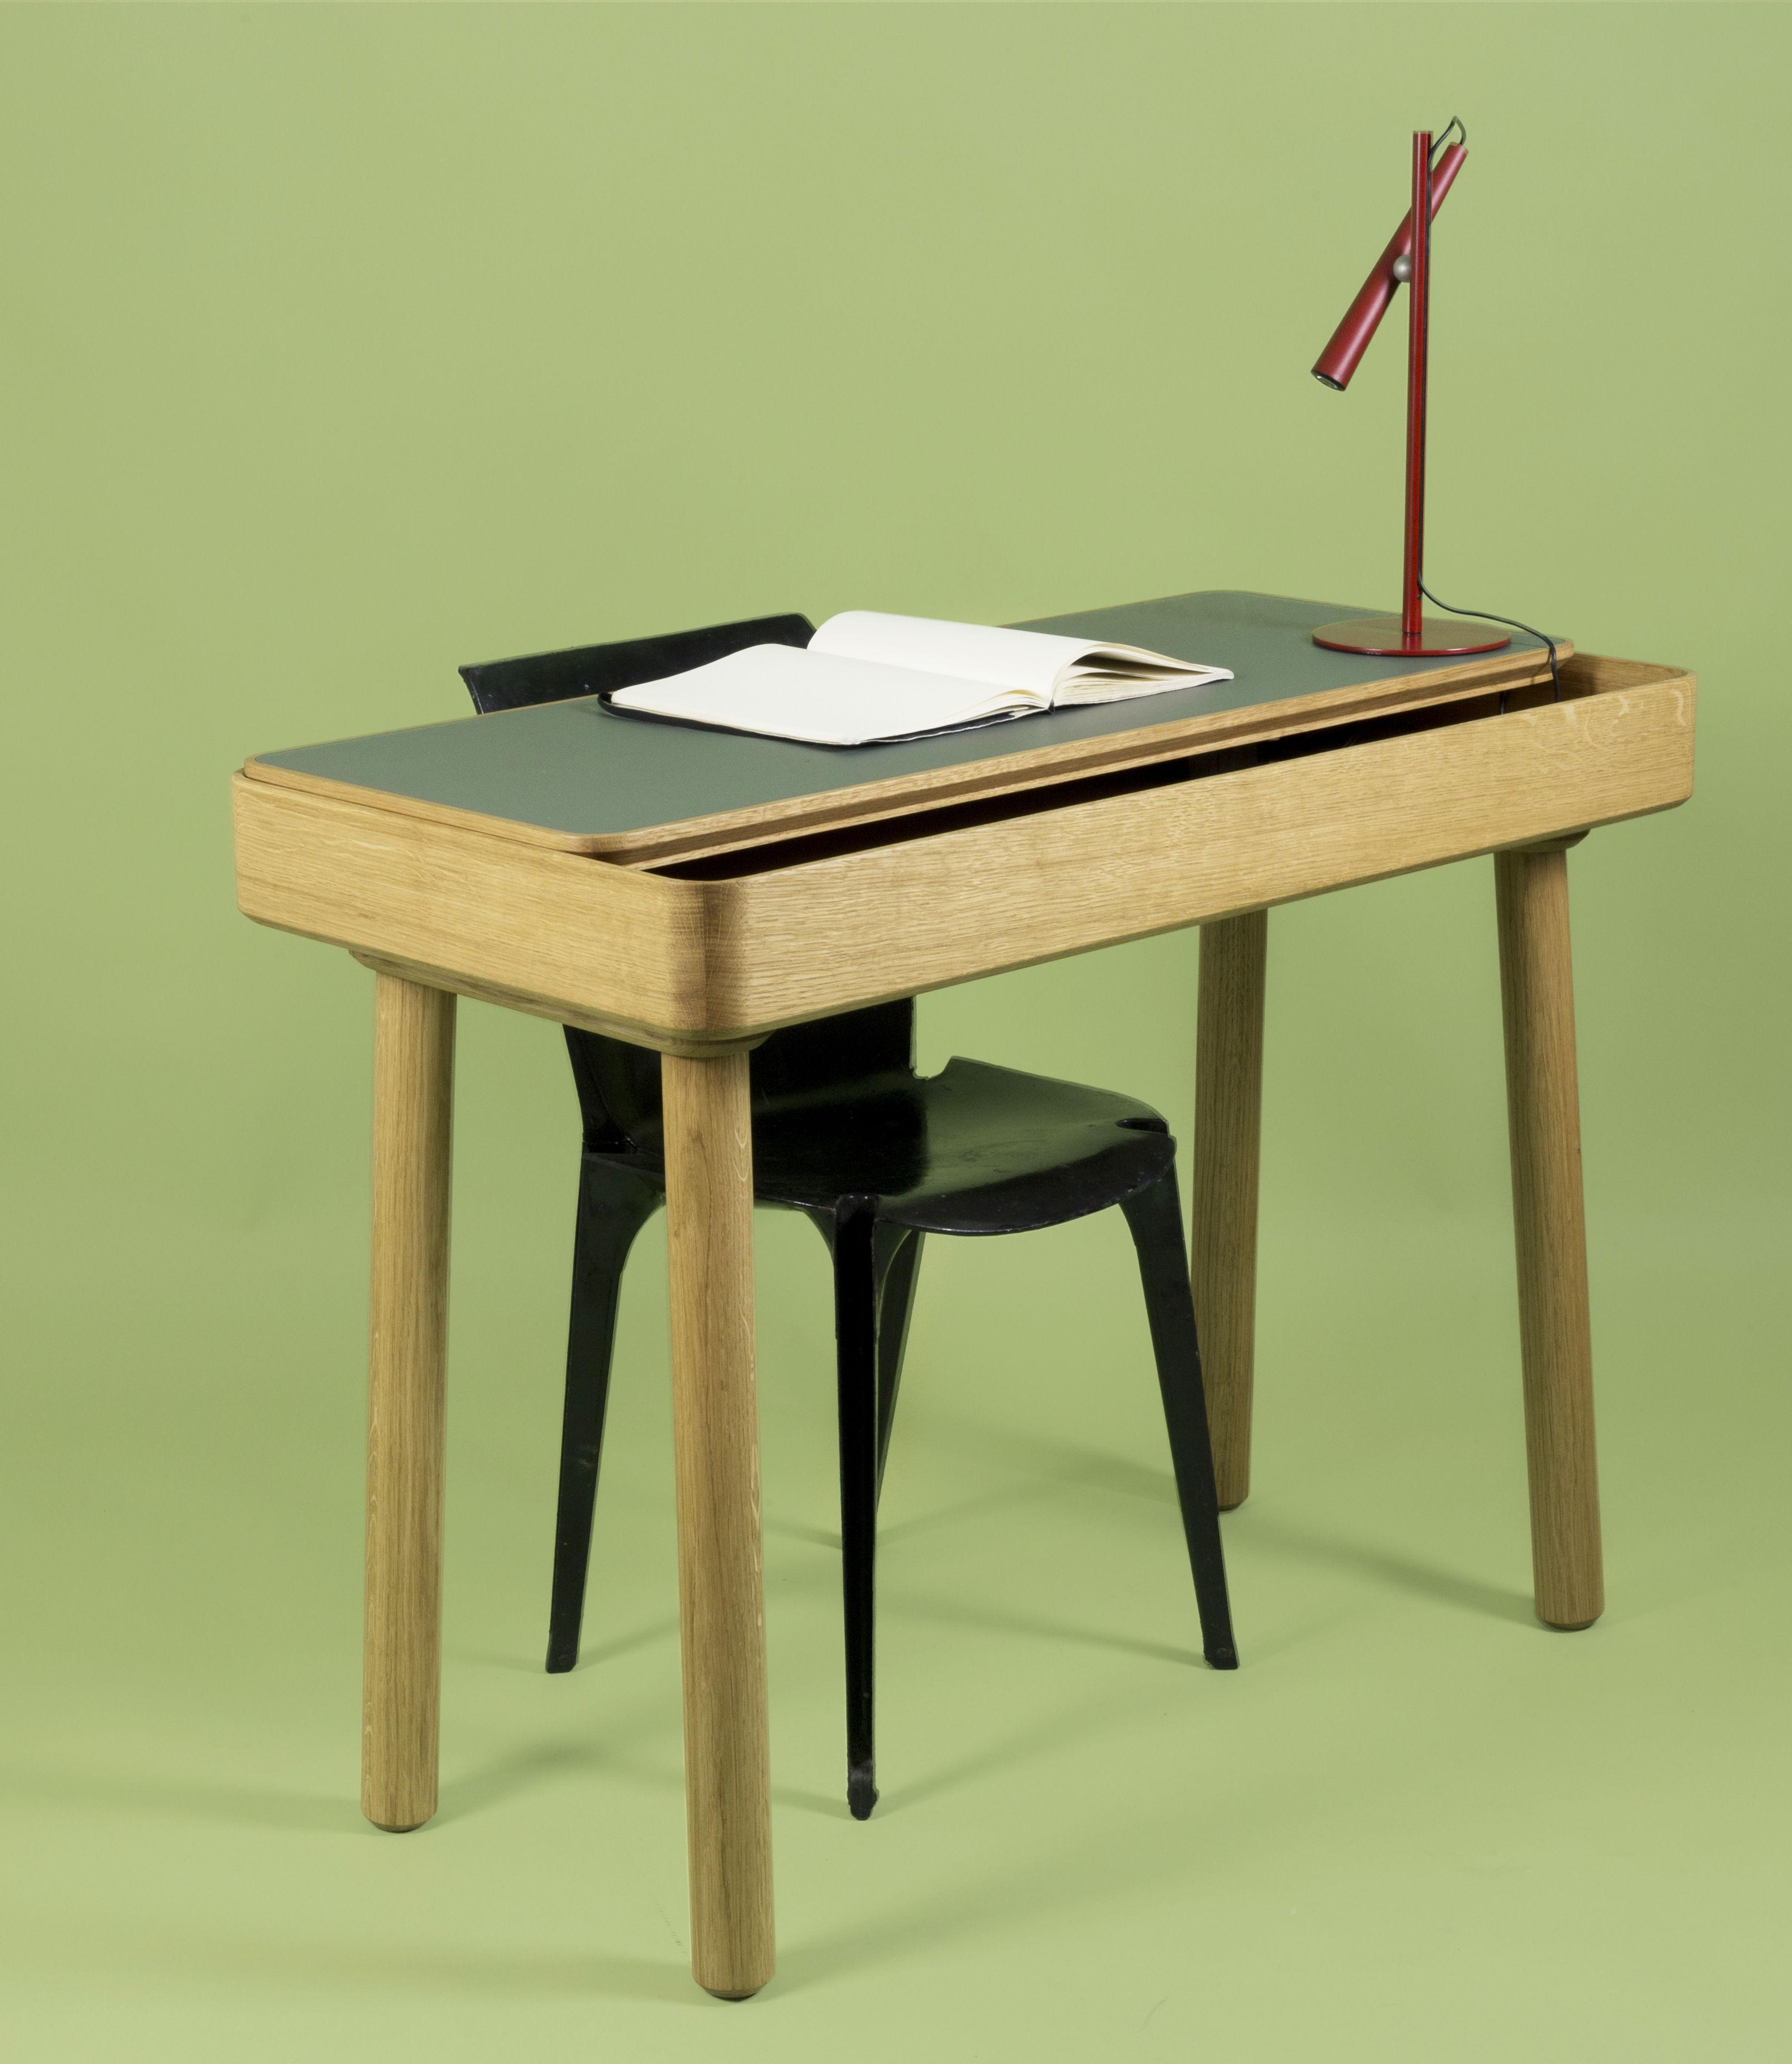 bureau avio internoitaliano linoleum gris ch ne l 100 x h 74 made in design. Black Bedroom Furniture Sets. Home Design Ideas